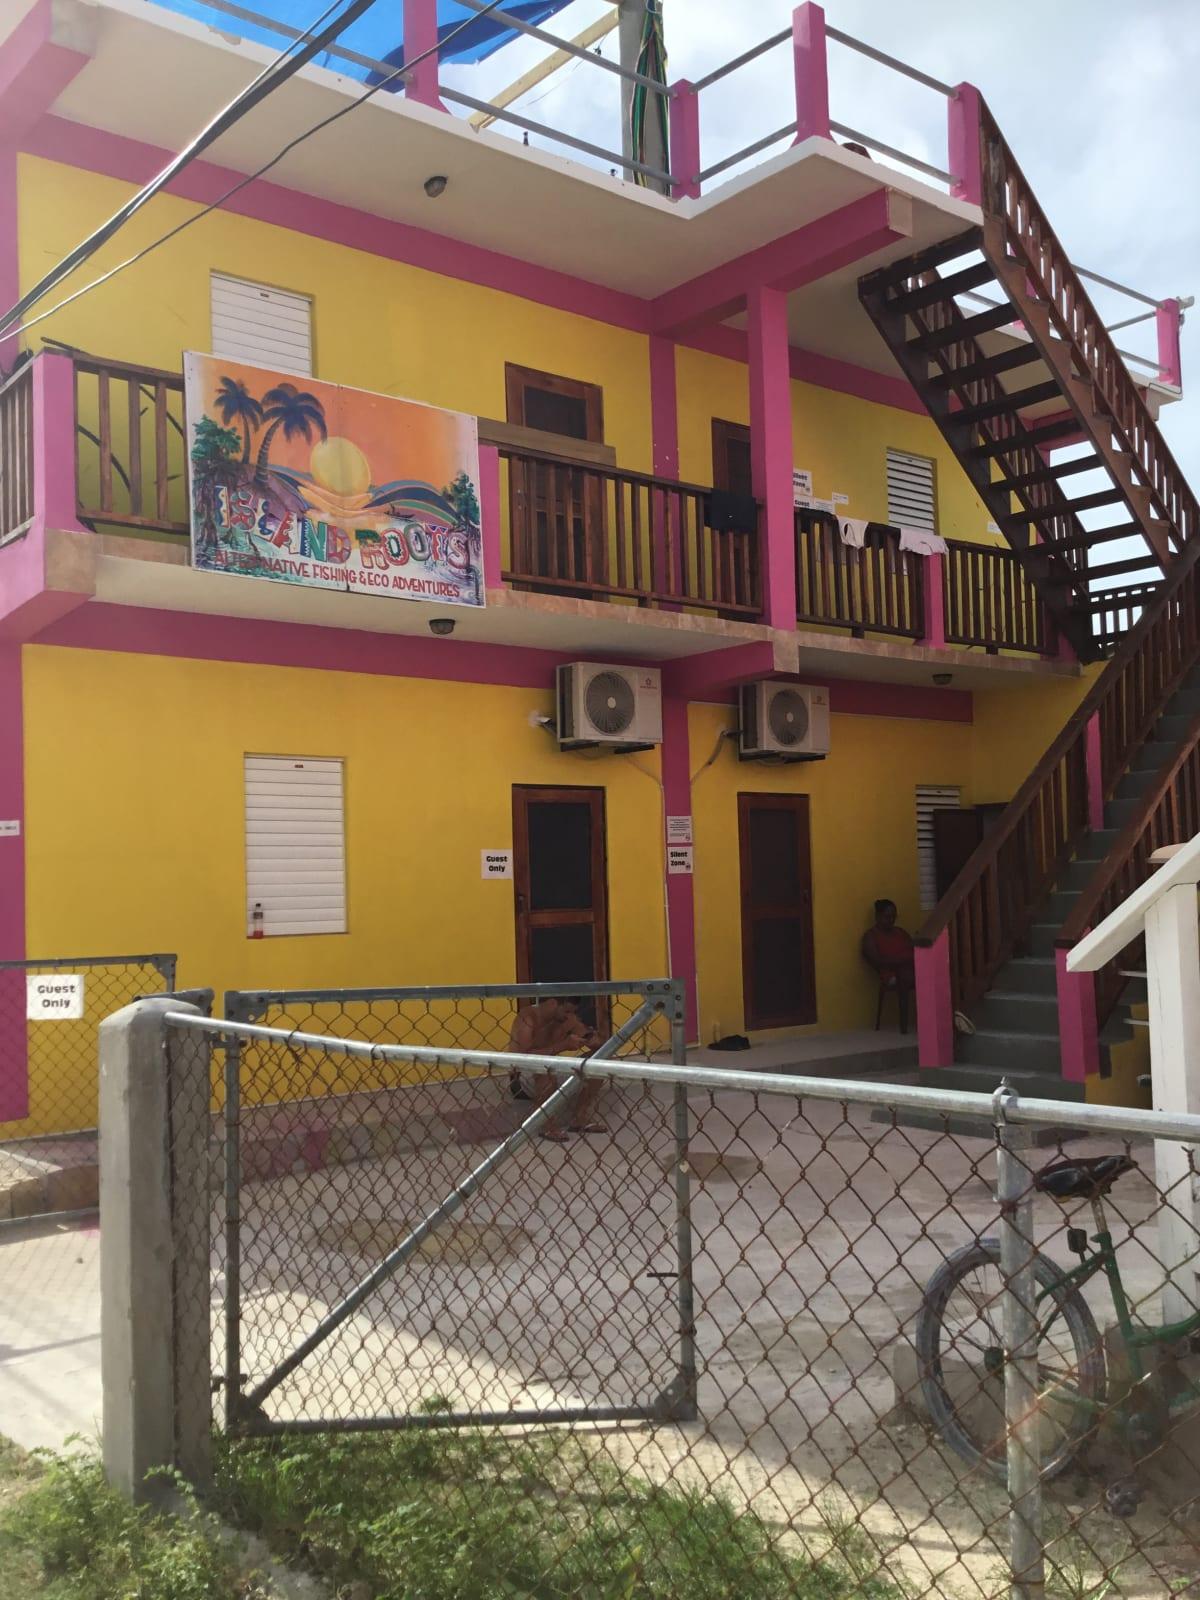 Travellers Palm Backpackers Hostel, Caye Caulker, Belize